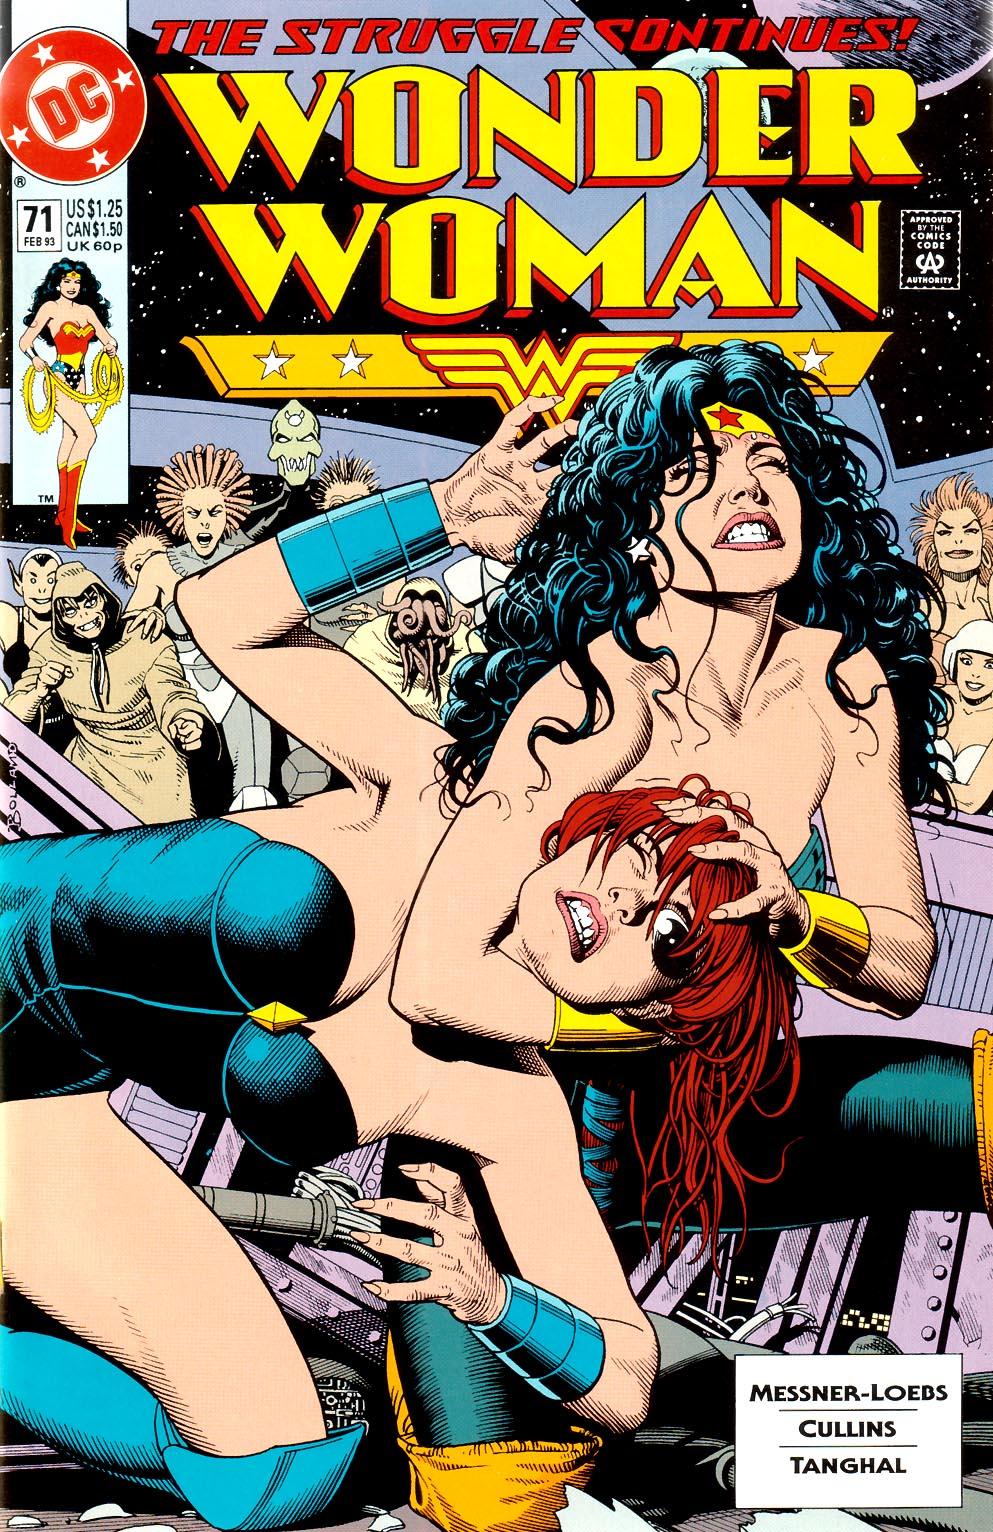 Read online Wonder Woman (1987) comic -  Issue #71 - 1